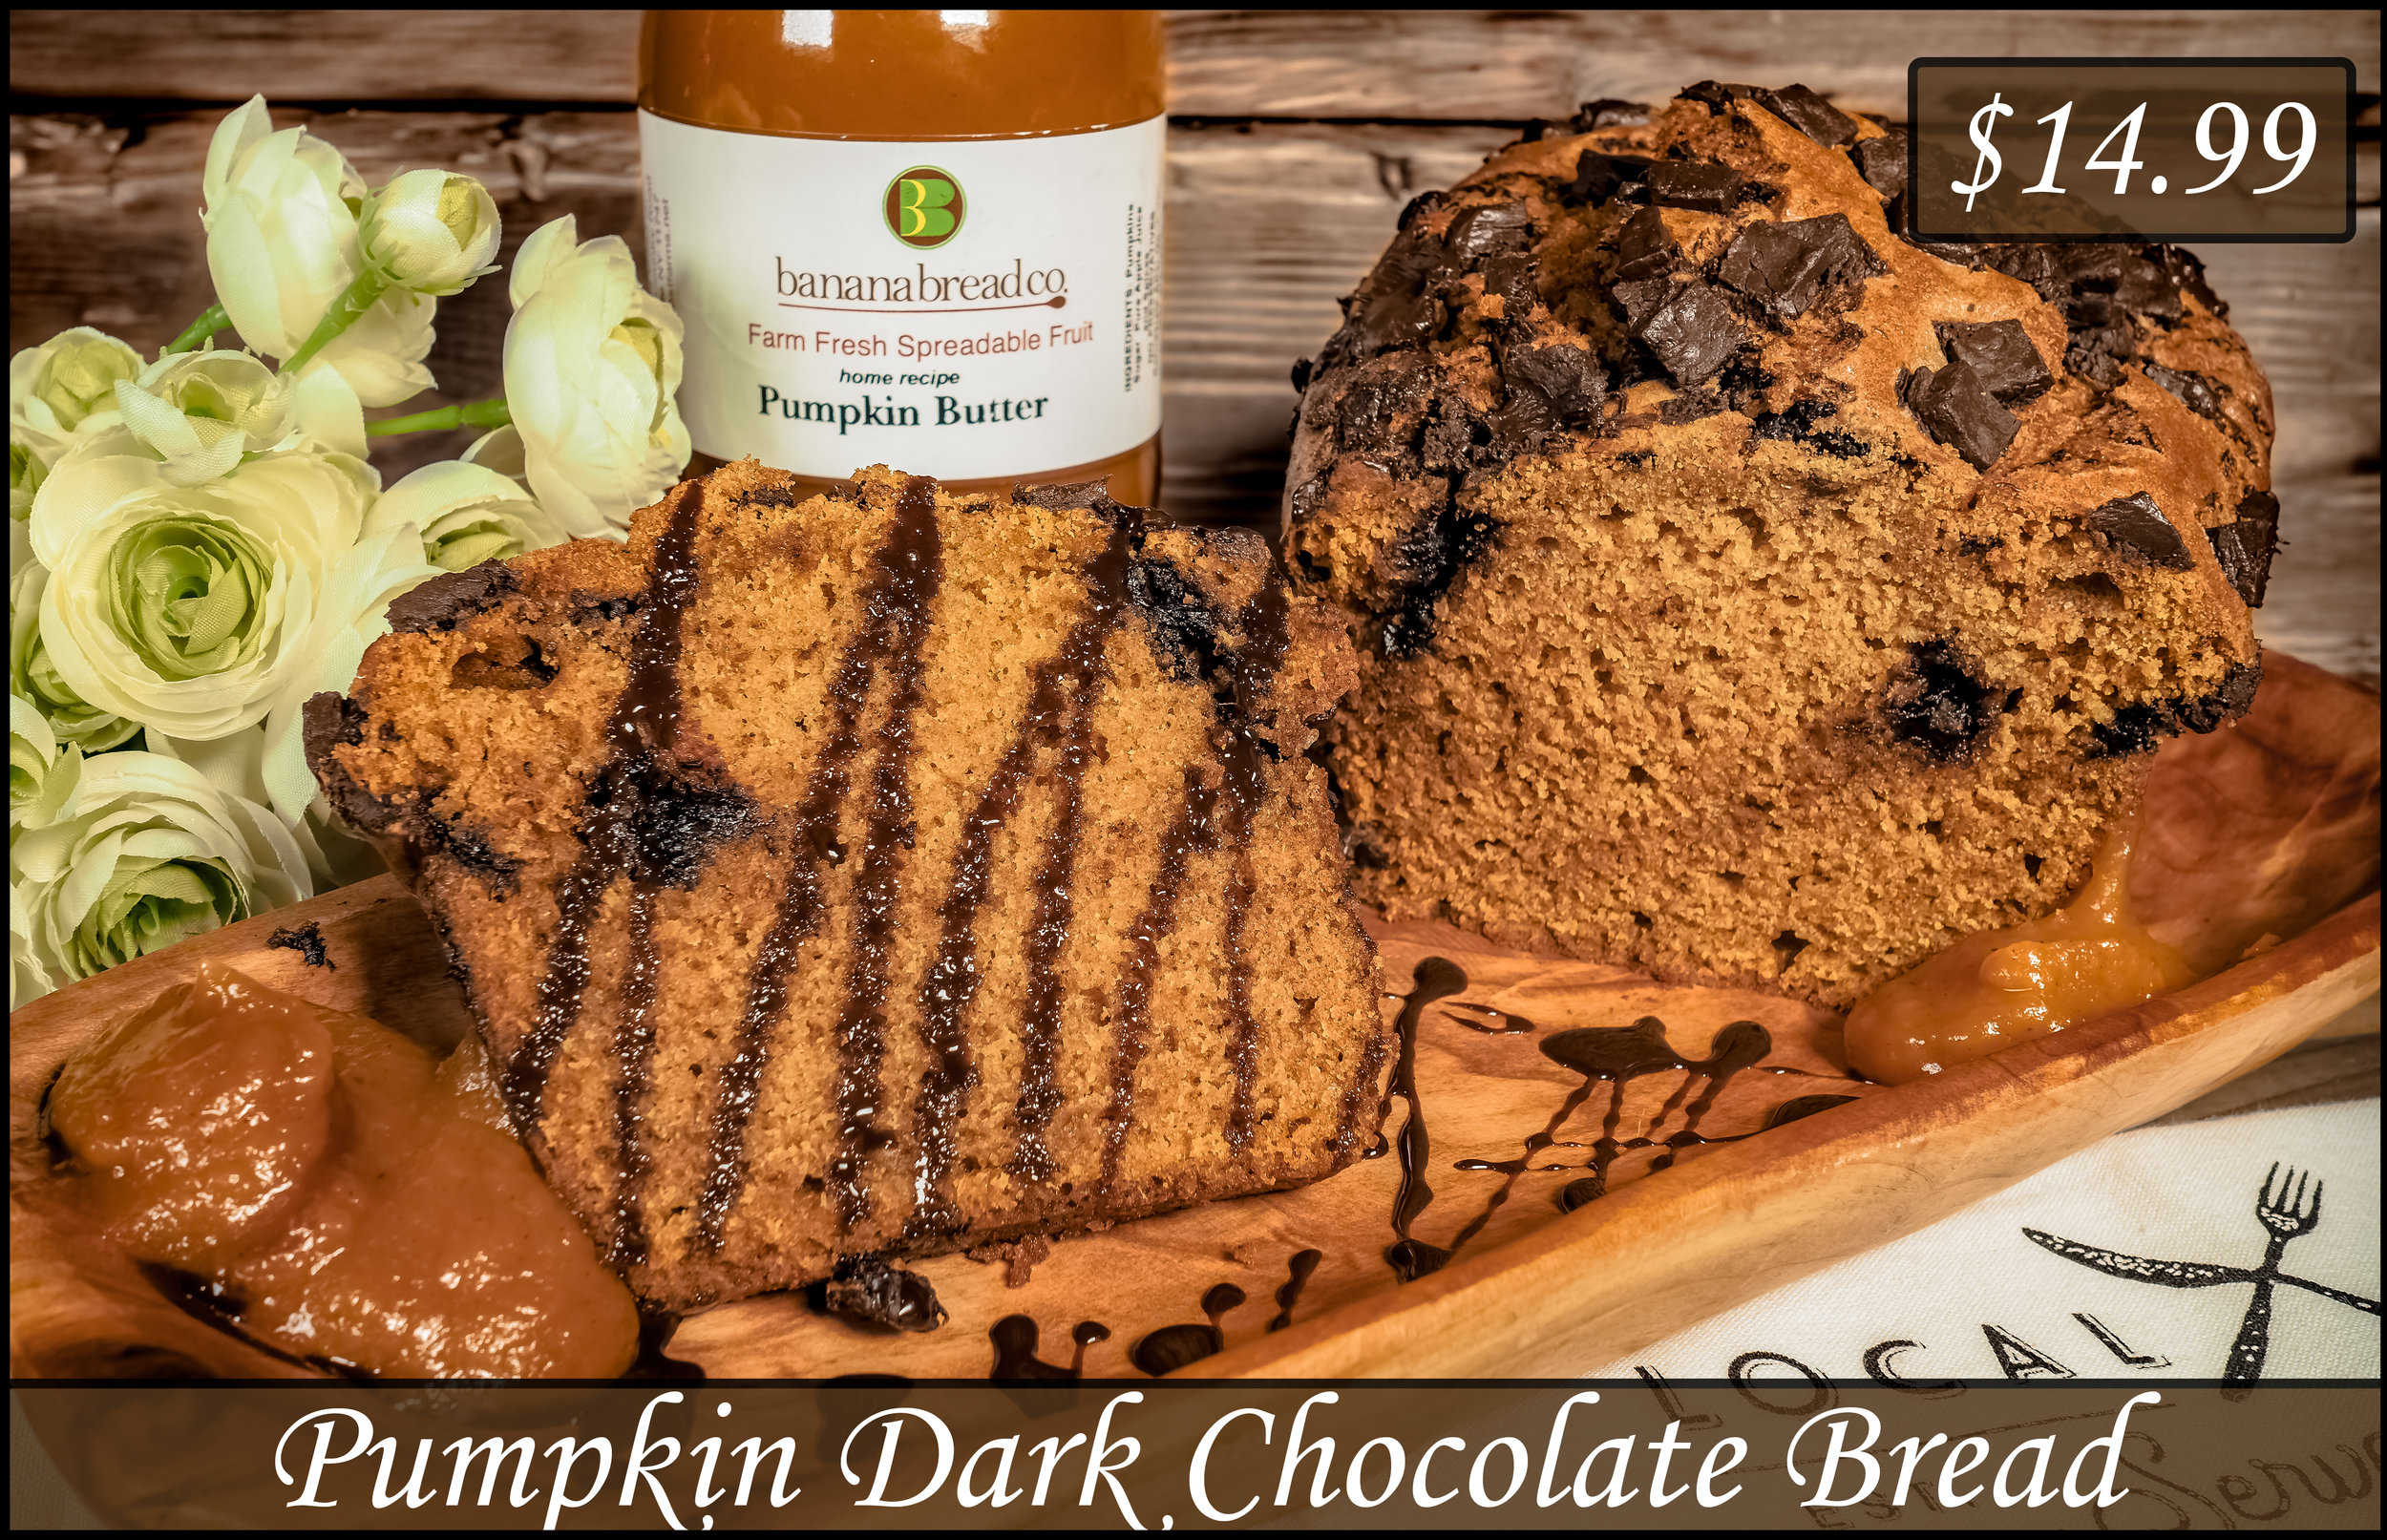 Pumpkin Dark Chocolate Bread.jpg